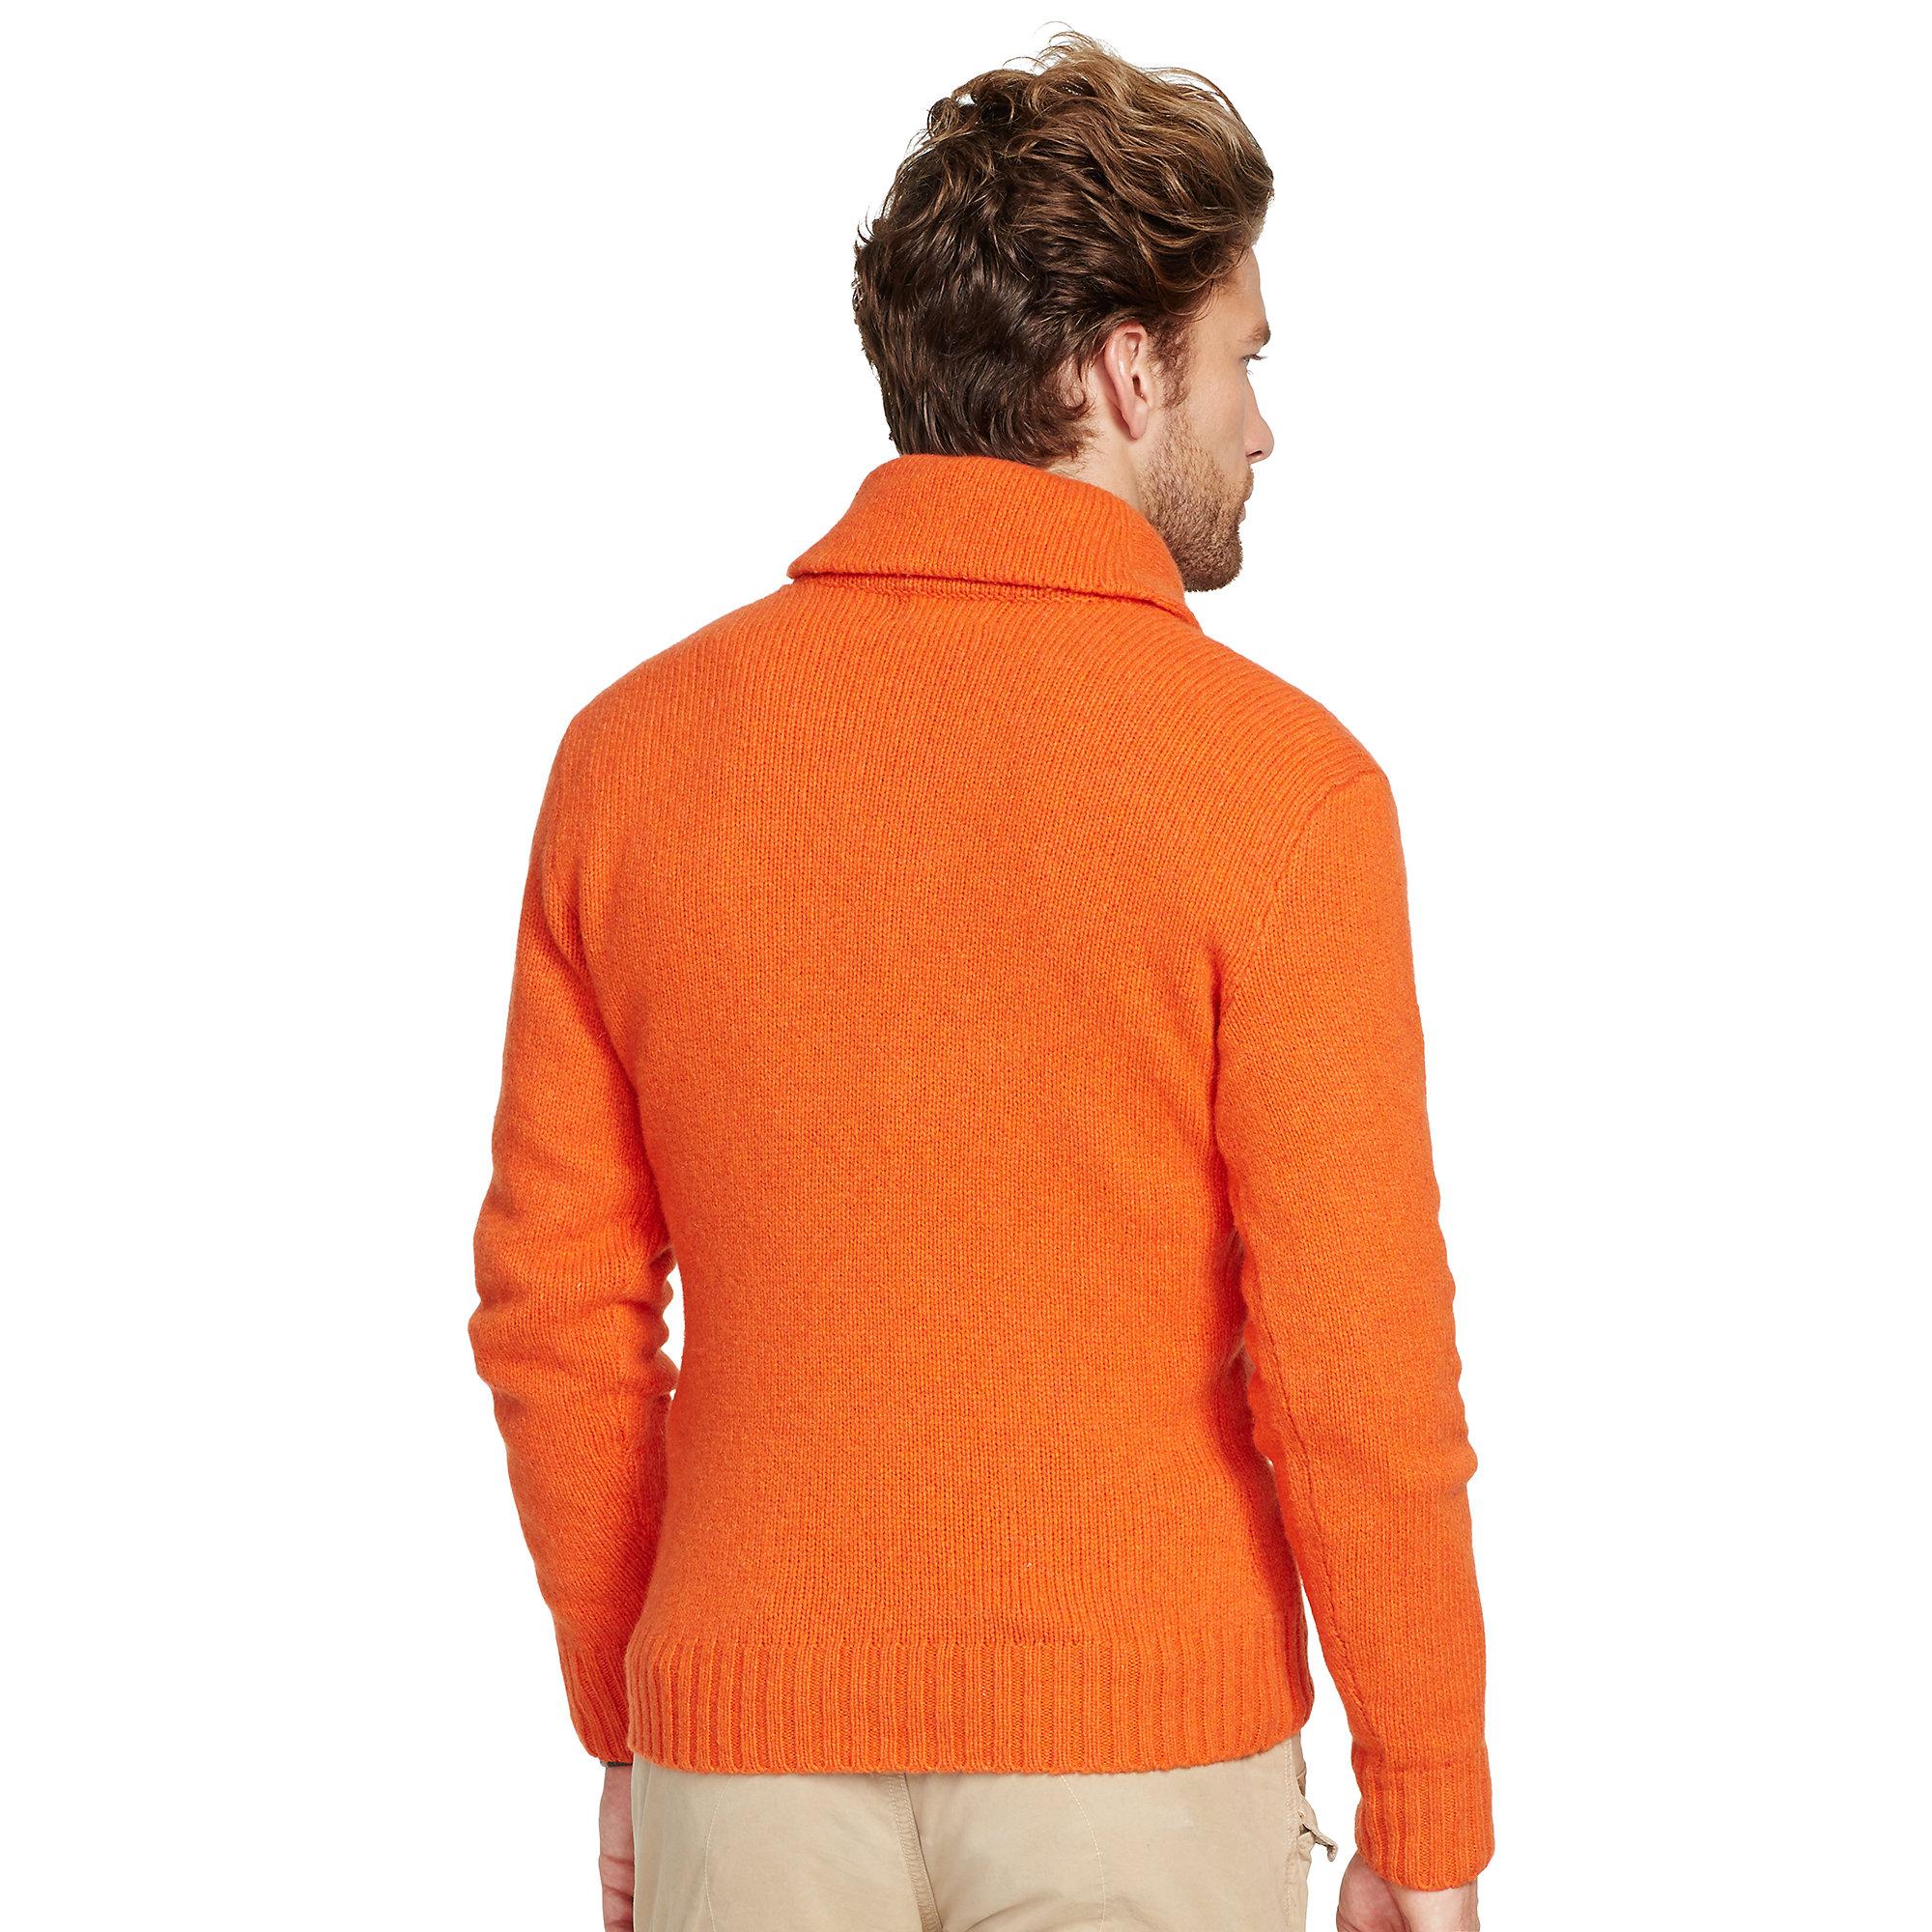 polo ralph lauren shawl pullover sweater in orange for men varsity orange heather lyst. Black Bedroom Furniture Sets. Home Design Ideas